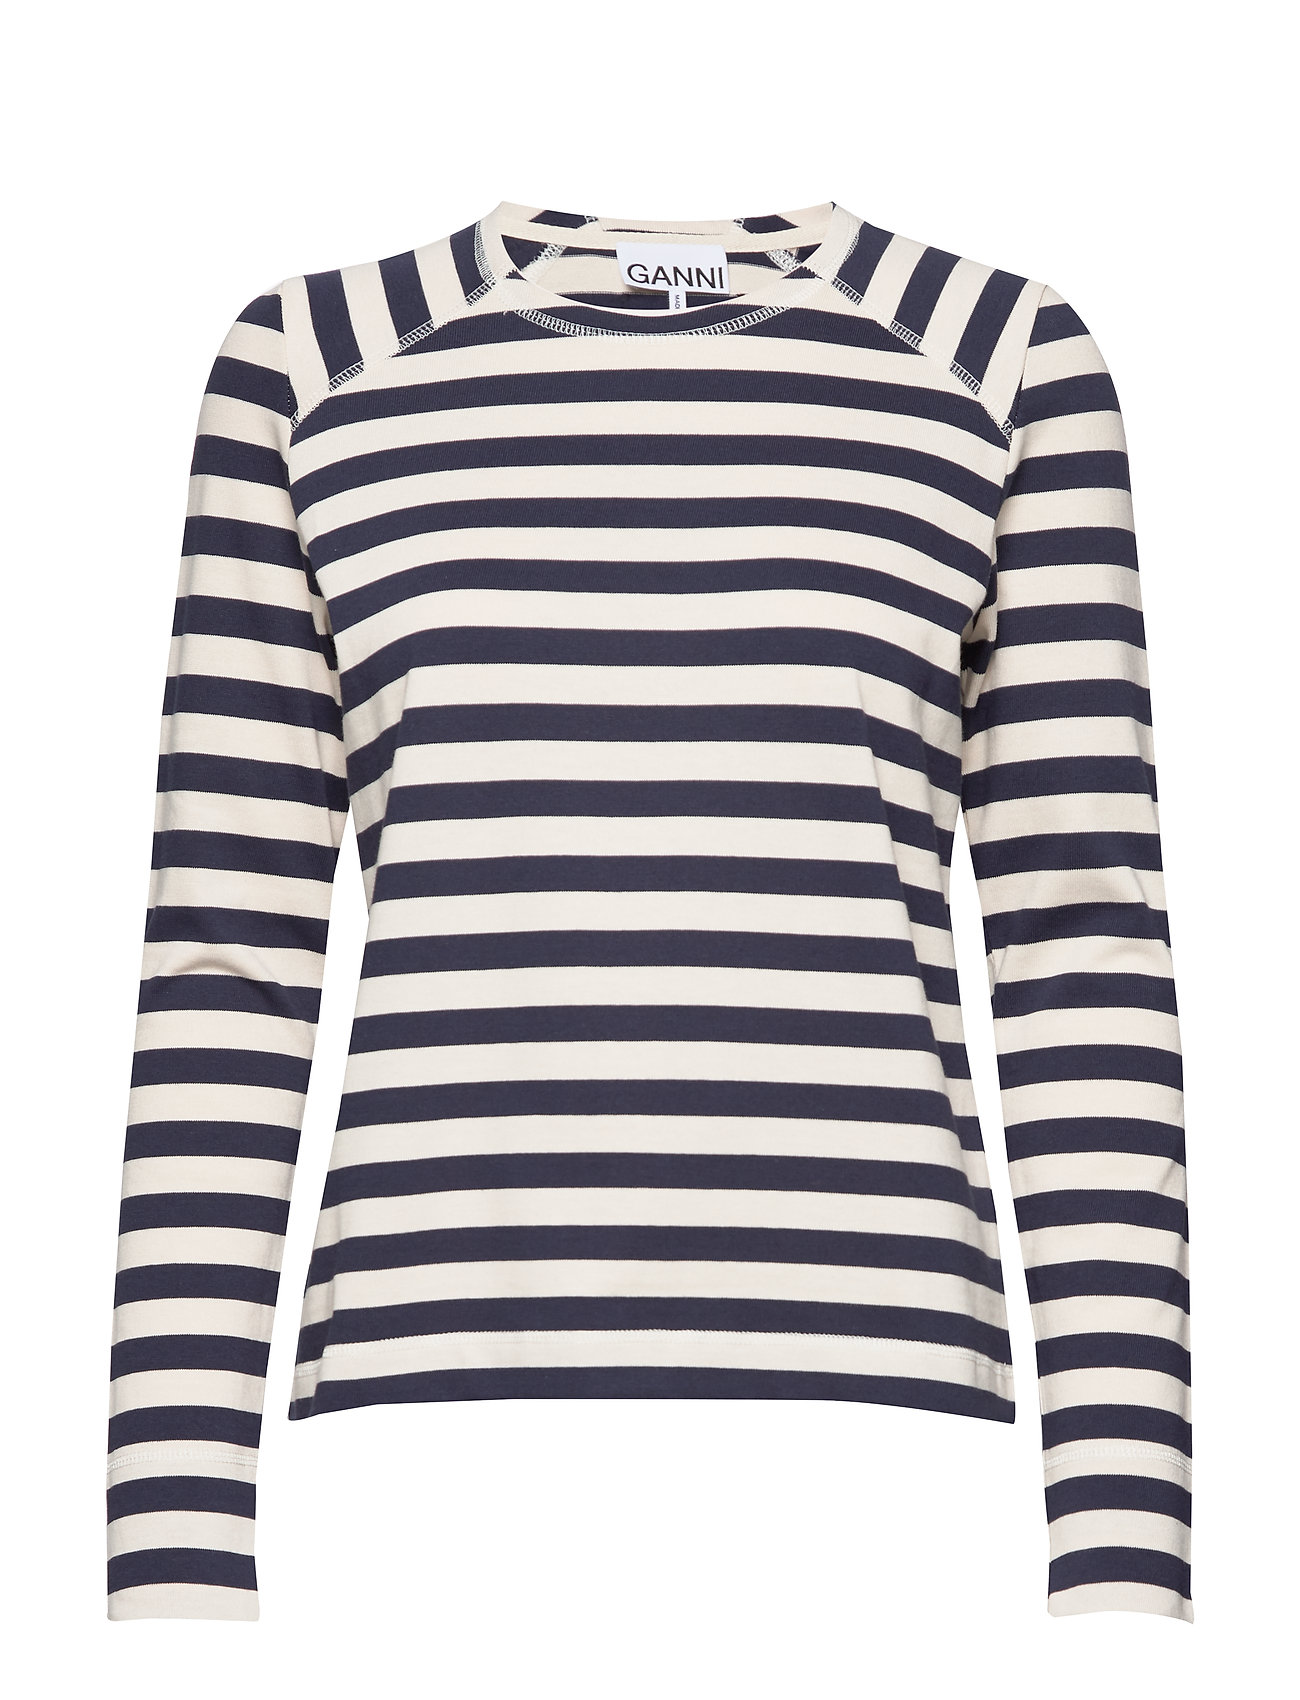 Ganni Striped Cotton Jersey - NATURE/DRESS BLUES